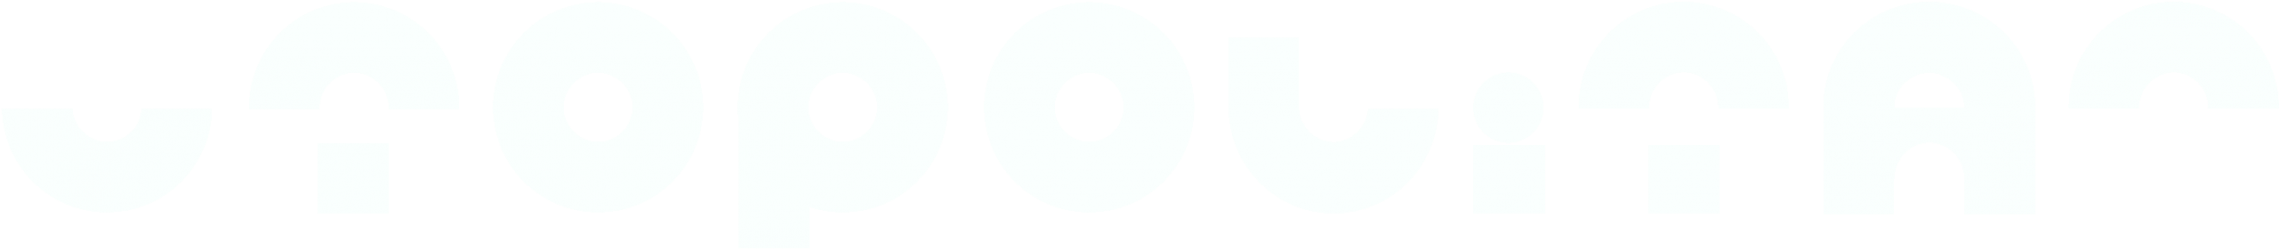 utopolitan.org